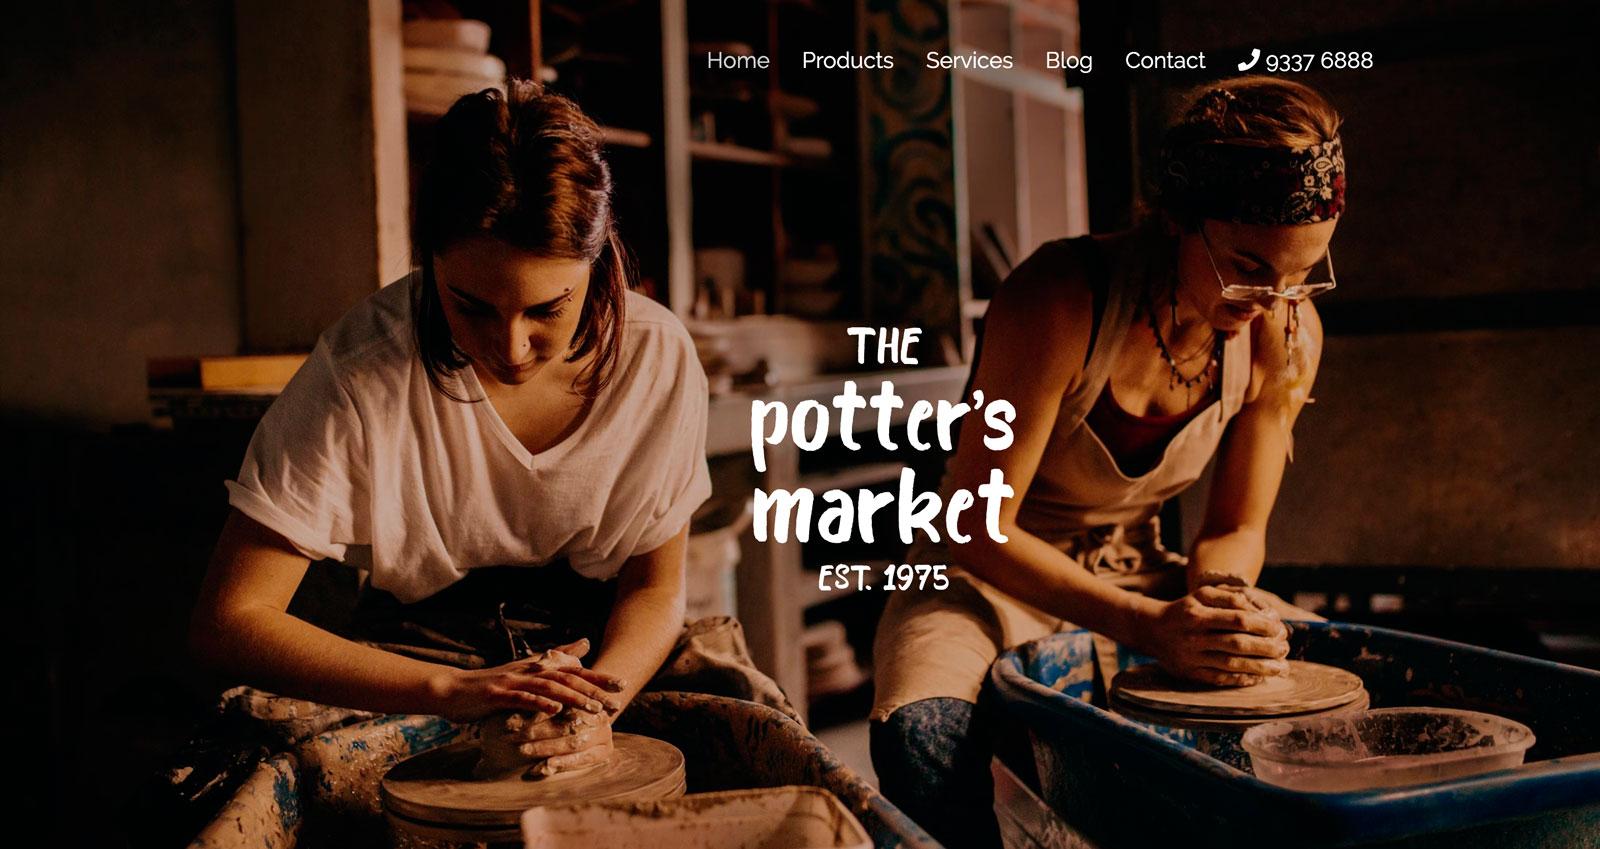 Potters Market Grab-2